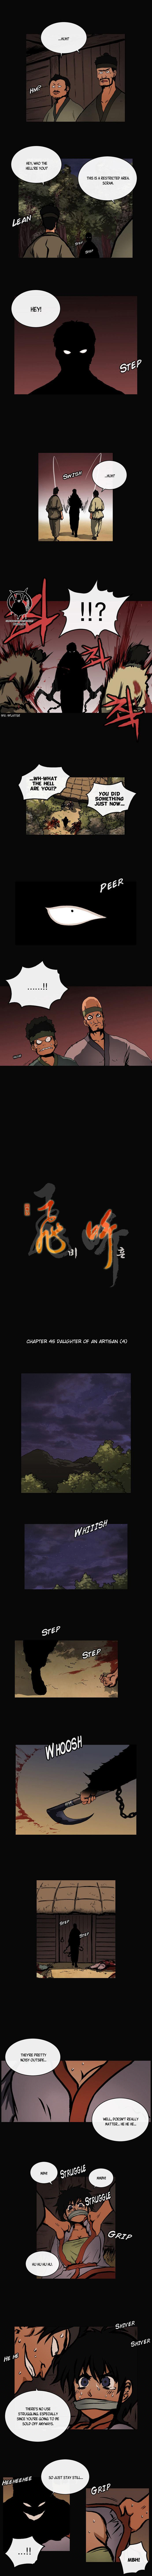 Be Heun 45 Page 2